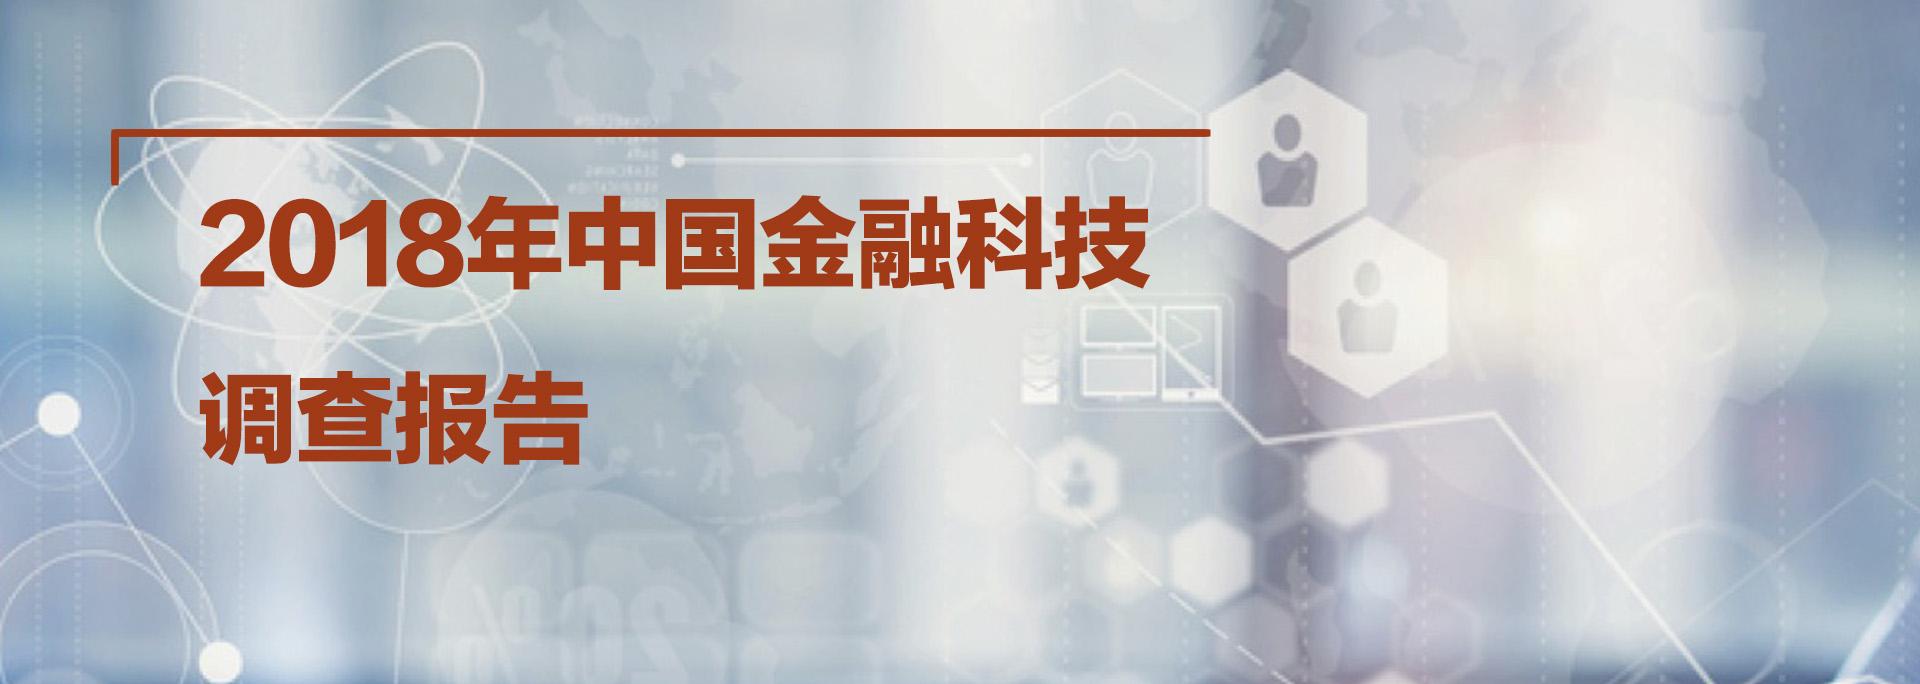 Tongdun Technology Enters PwC's China Fintech Survey 2018